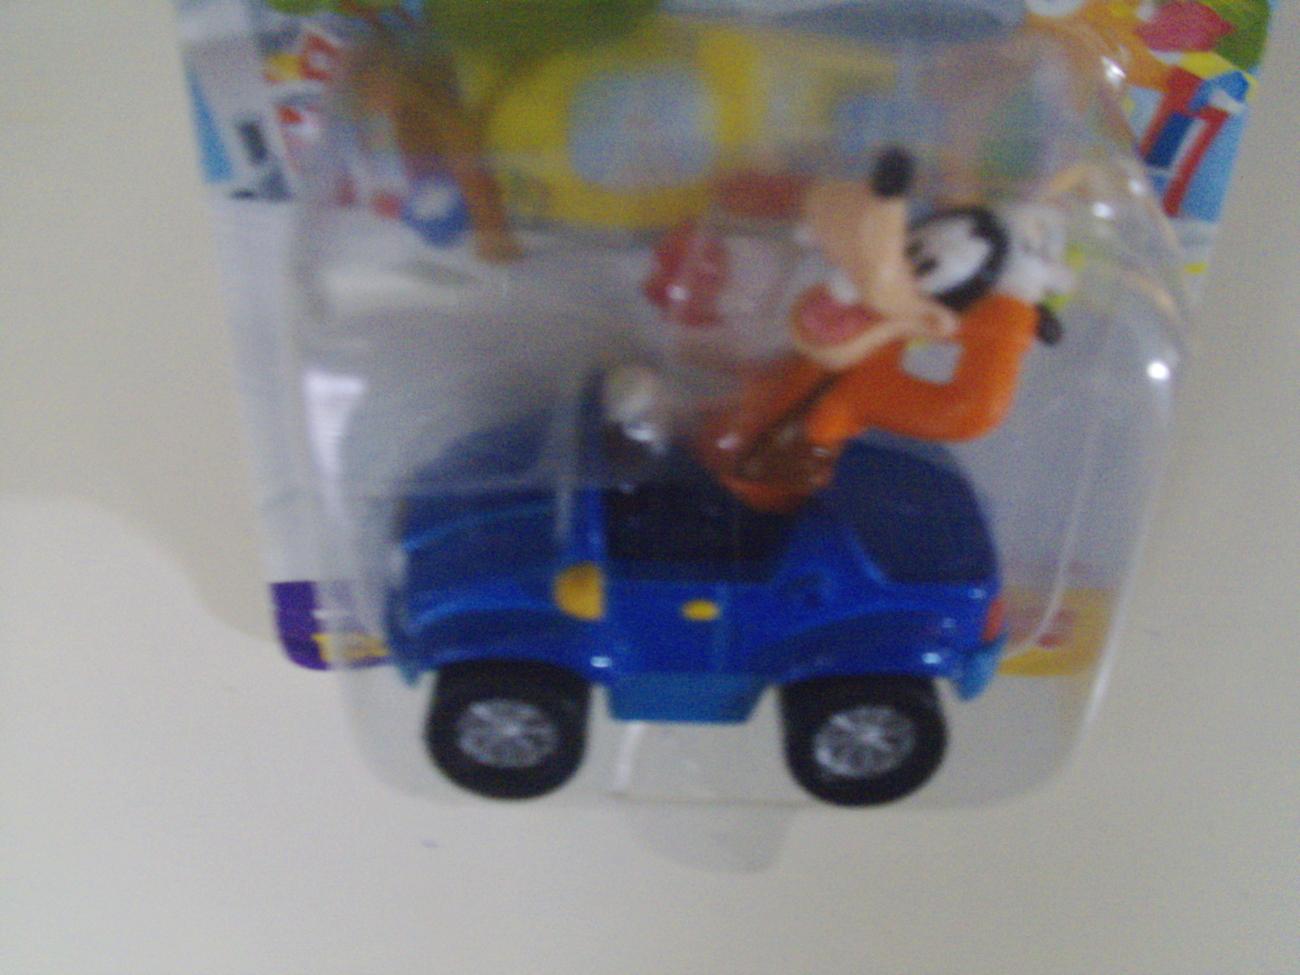 Disney Fisher-Price Joy Rider Goofy die-cast car - New